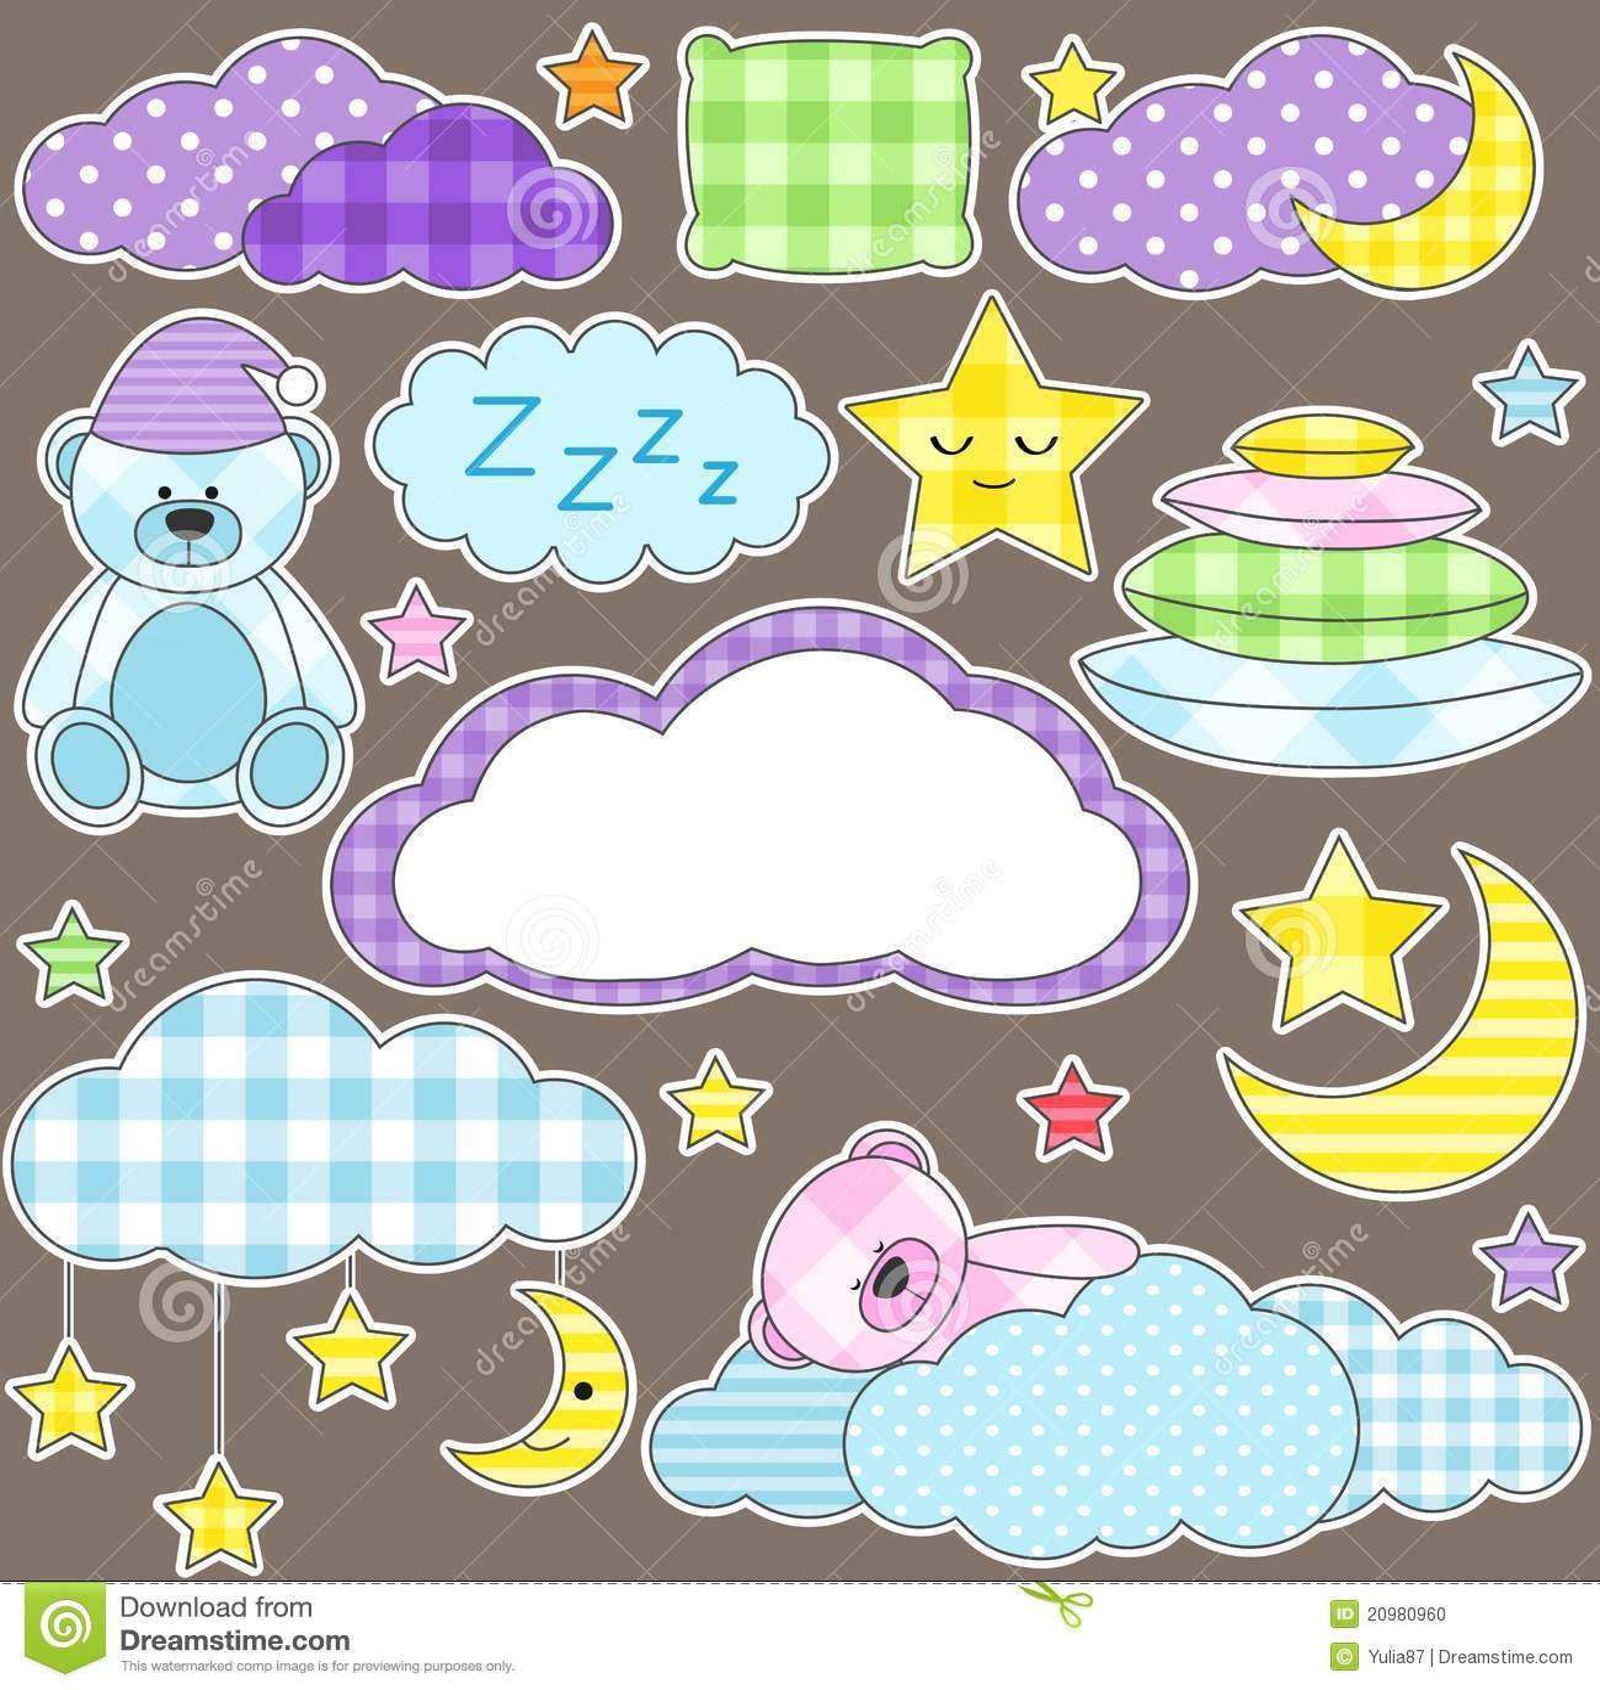 Night Stickers Stock Photo  Image 20980960